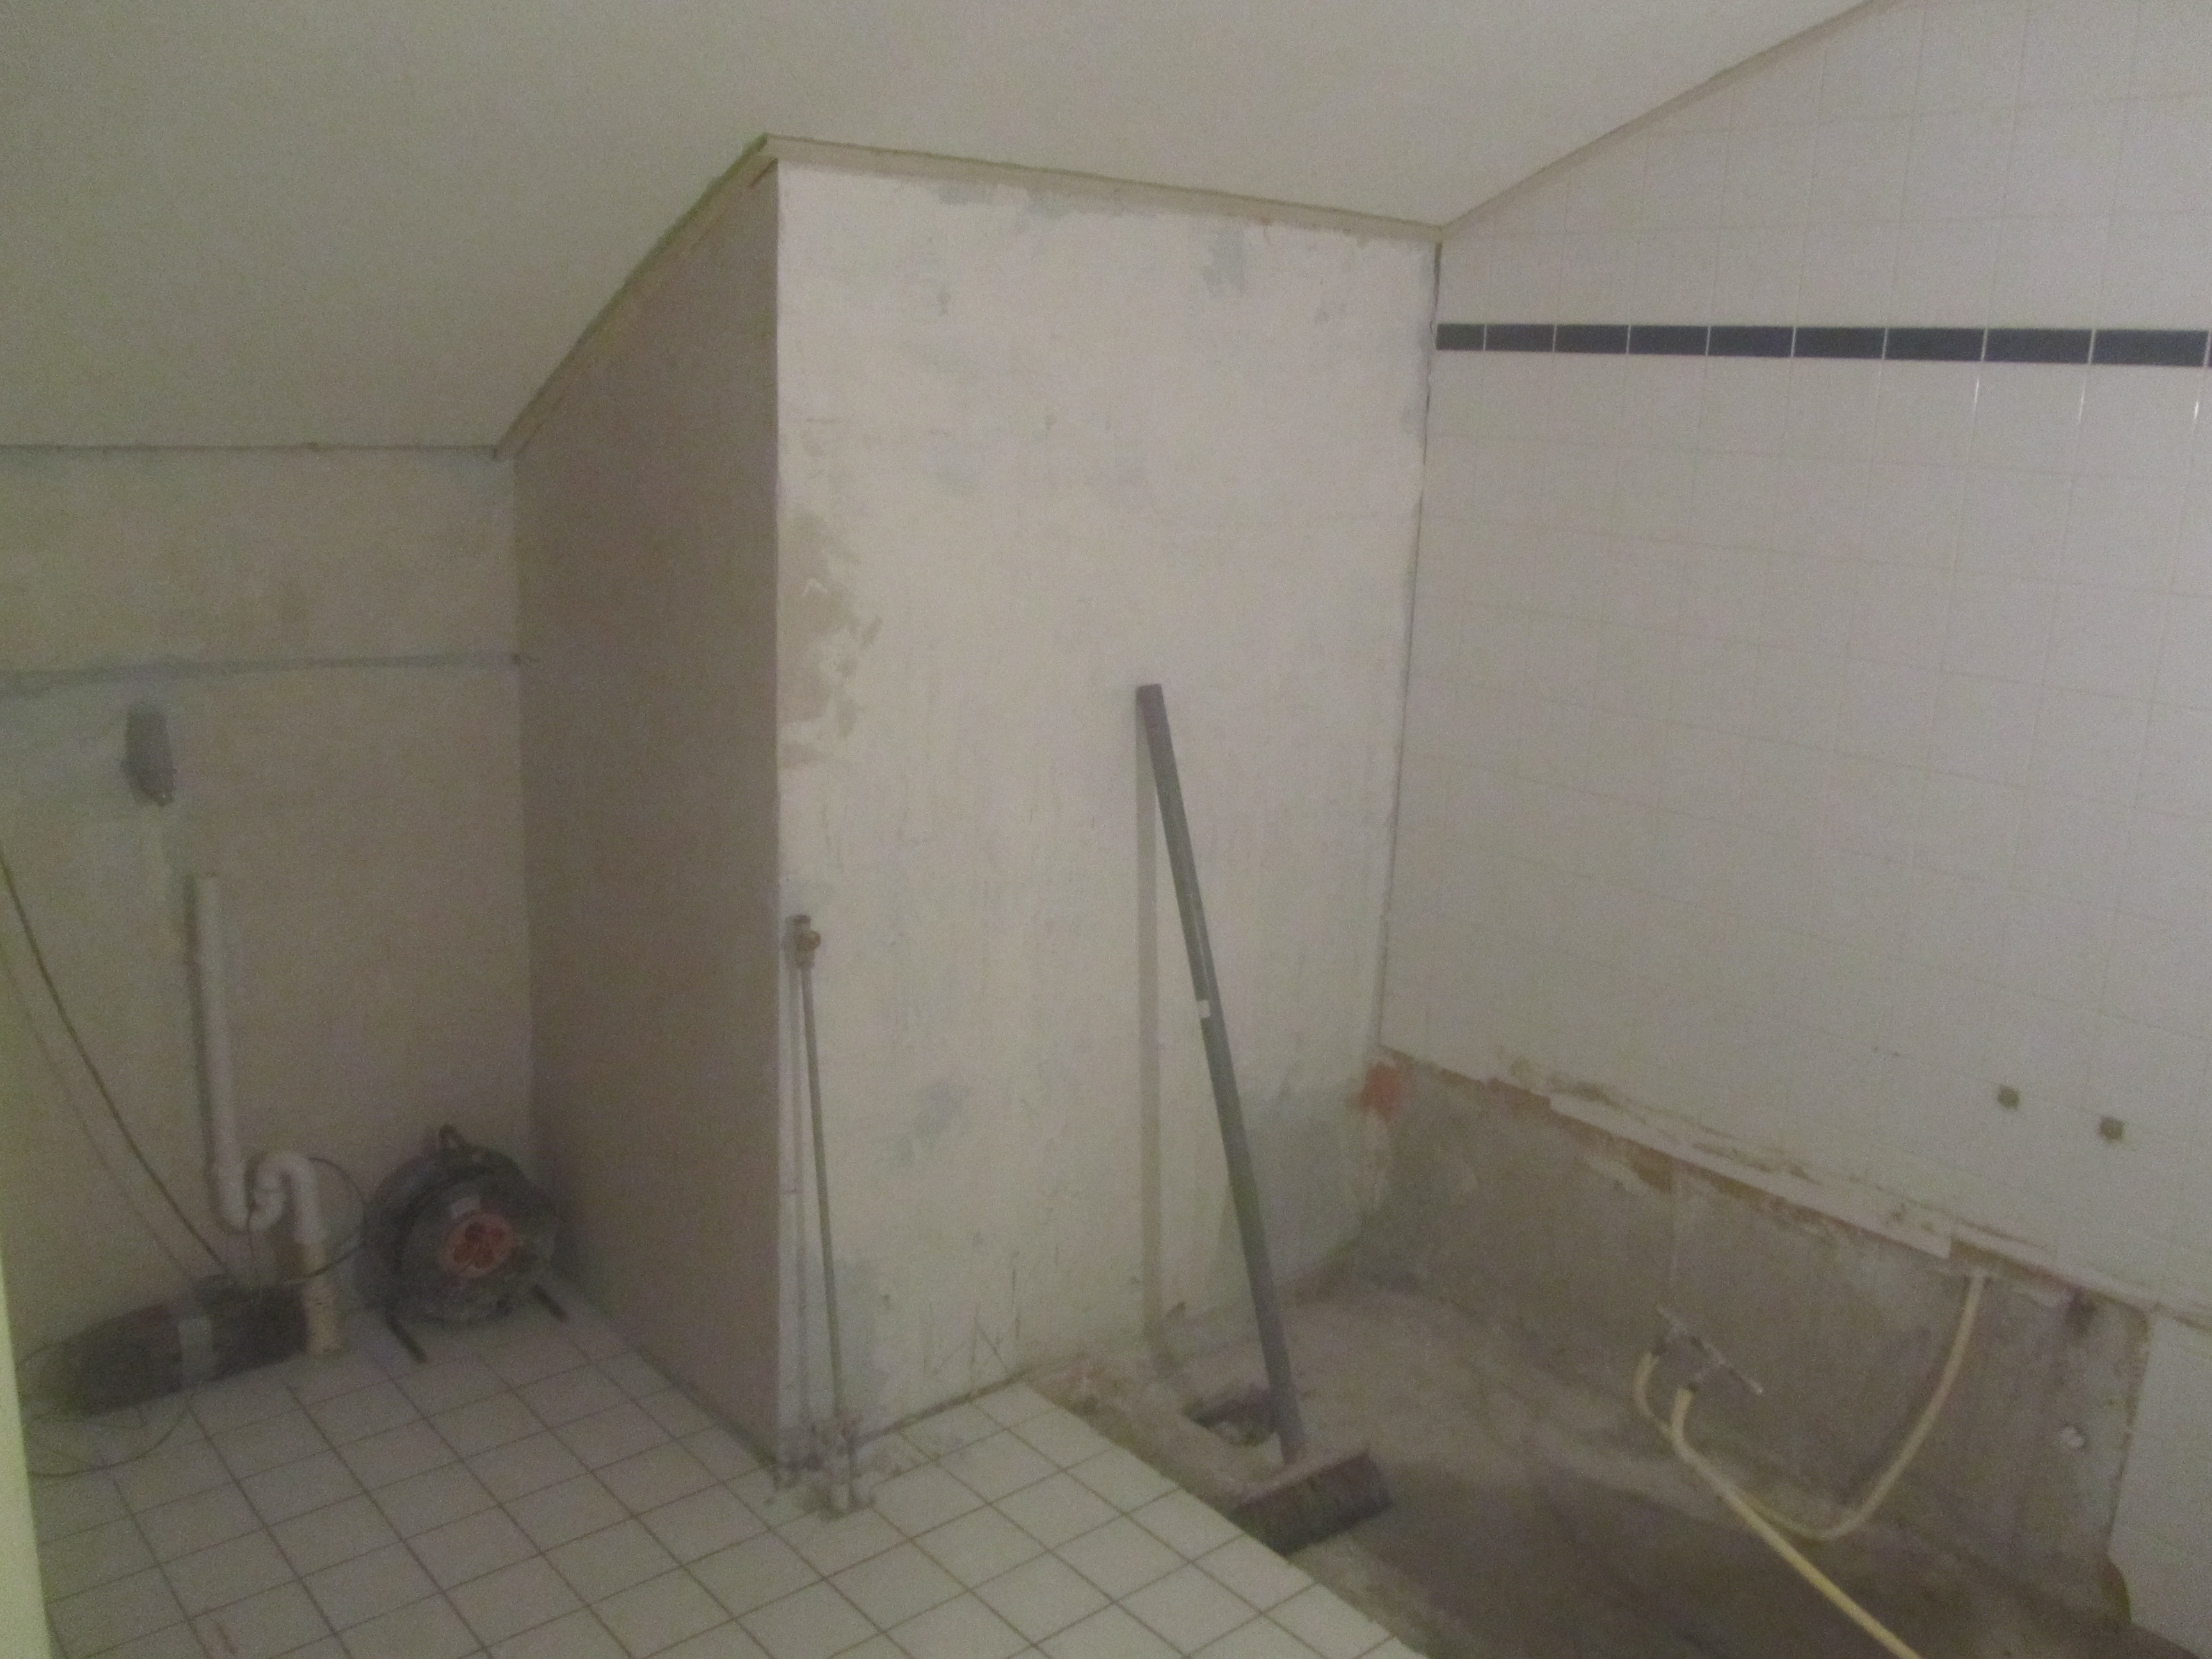 Badkamer renoveren - ESB OnderhoudESB Onderhoud